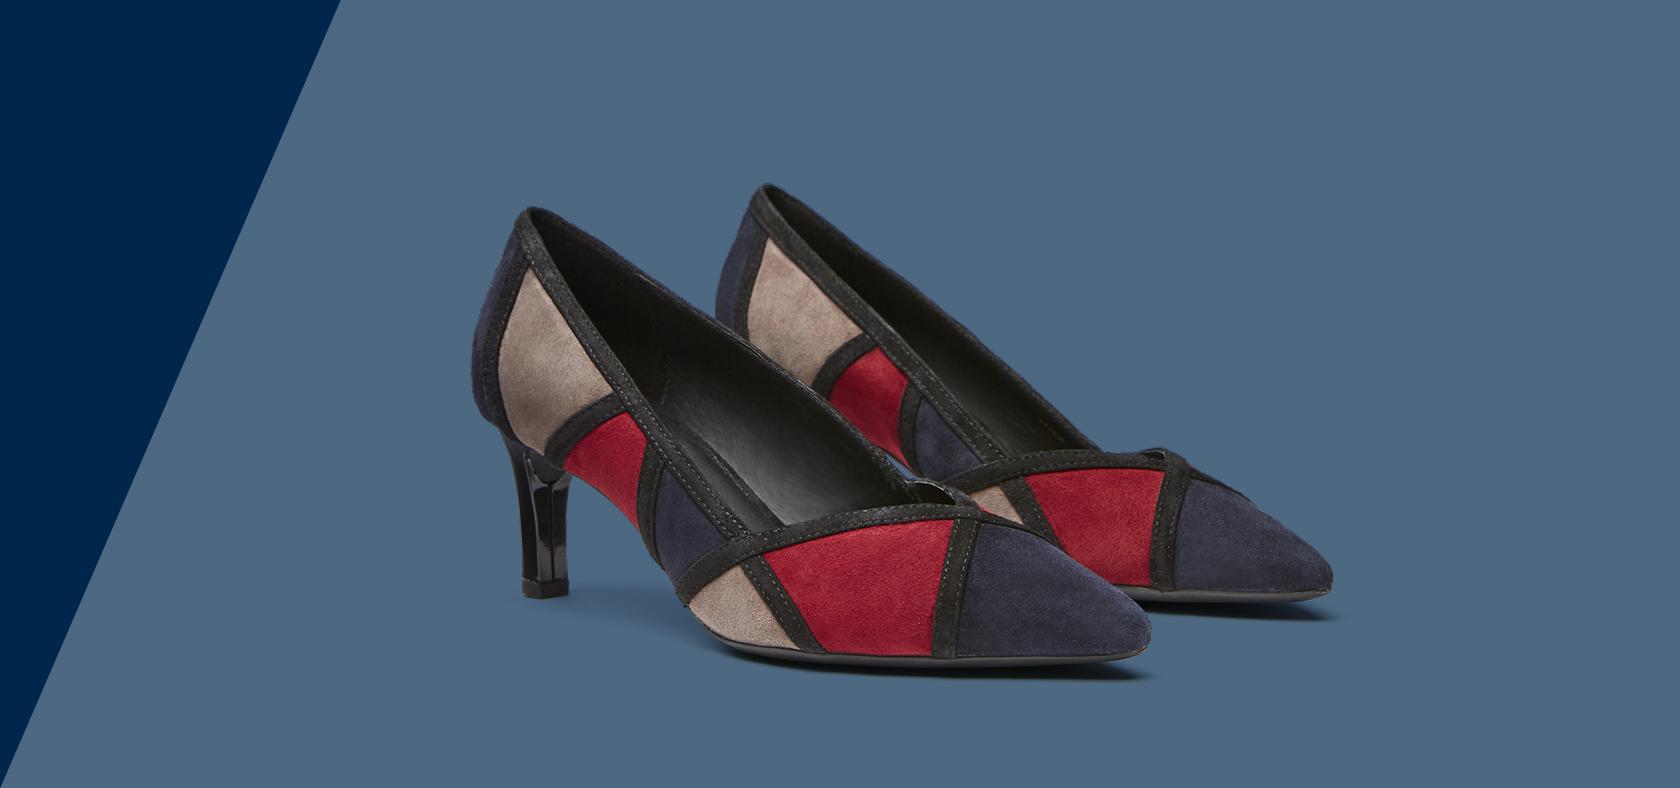 0a4d0b86a2e409 Comfortable and Breathable Women s Pumps Shoes